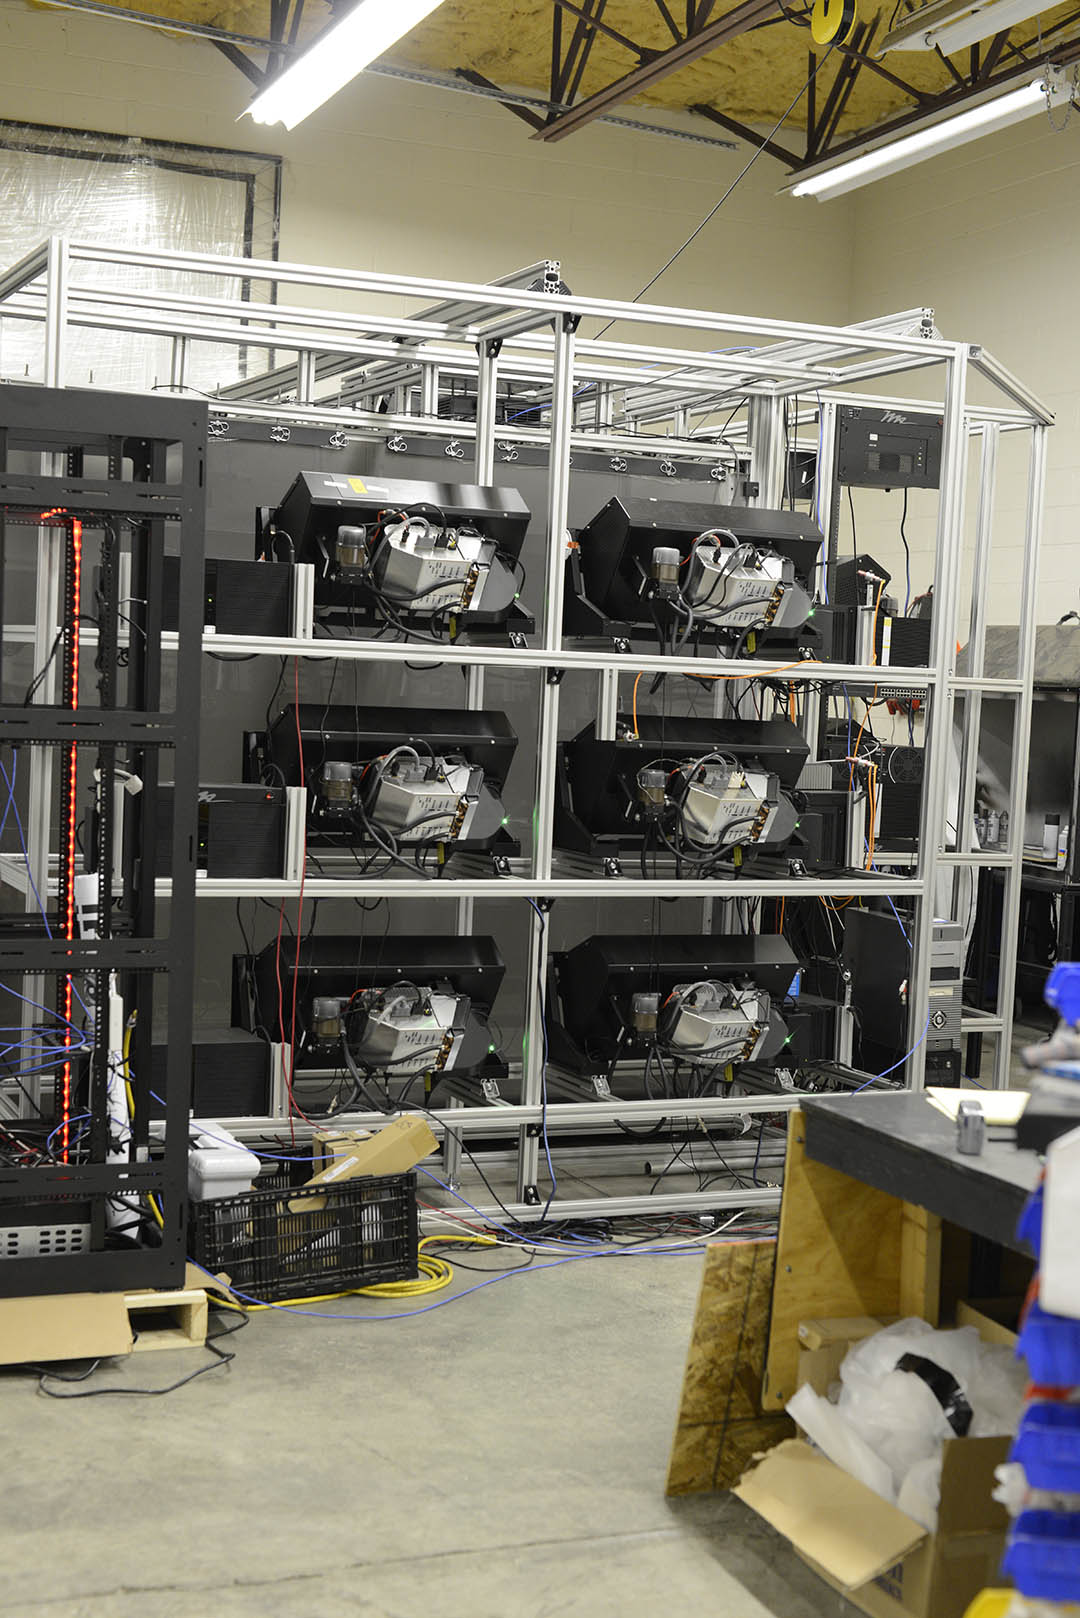 IGI HD CAVE custom design system fabrication